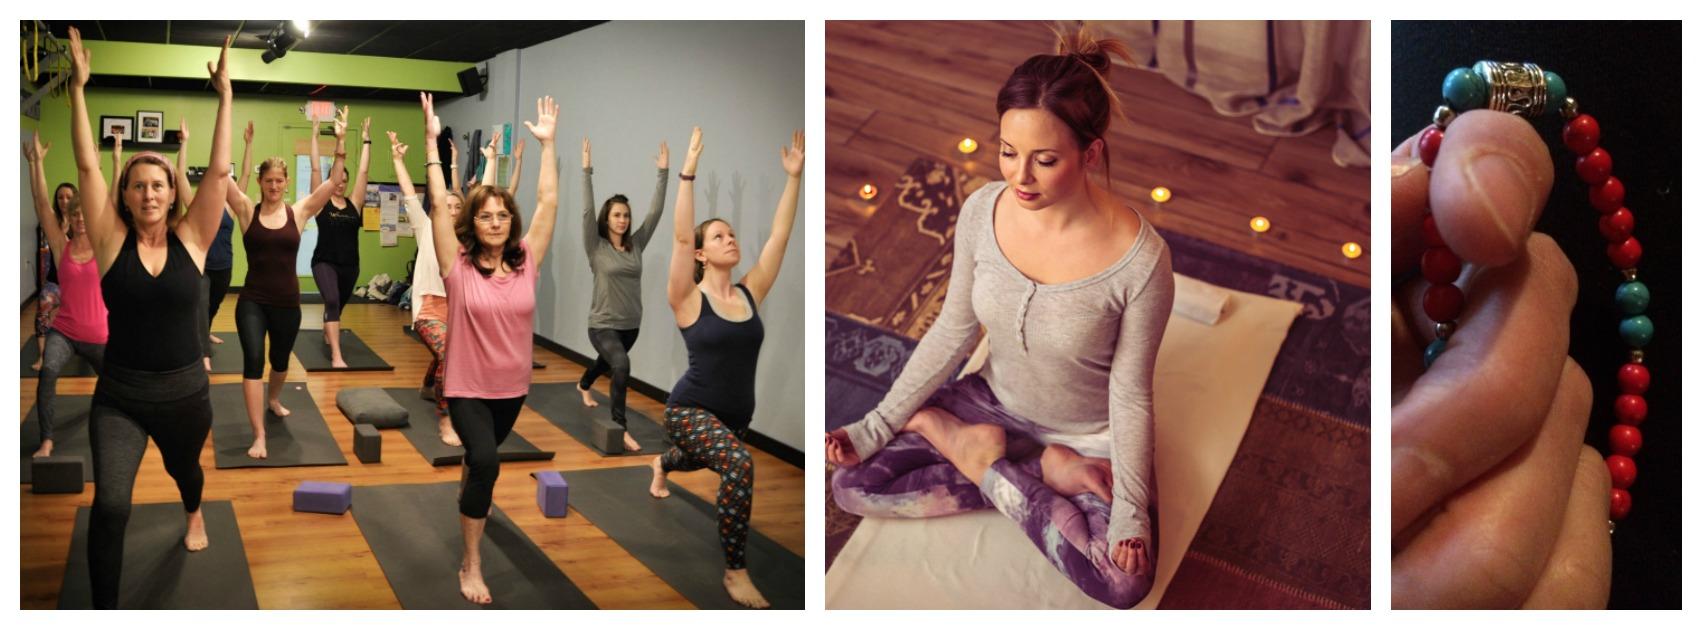 yoga mala meditaiton